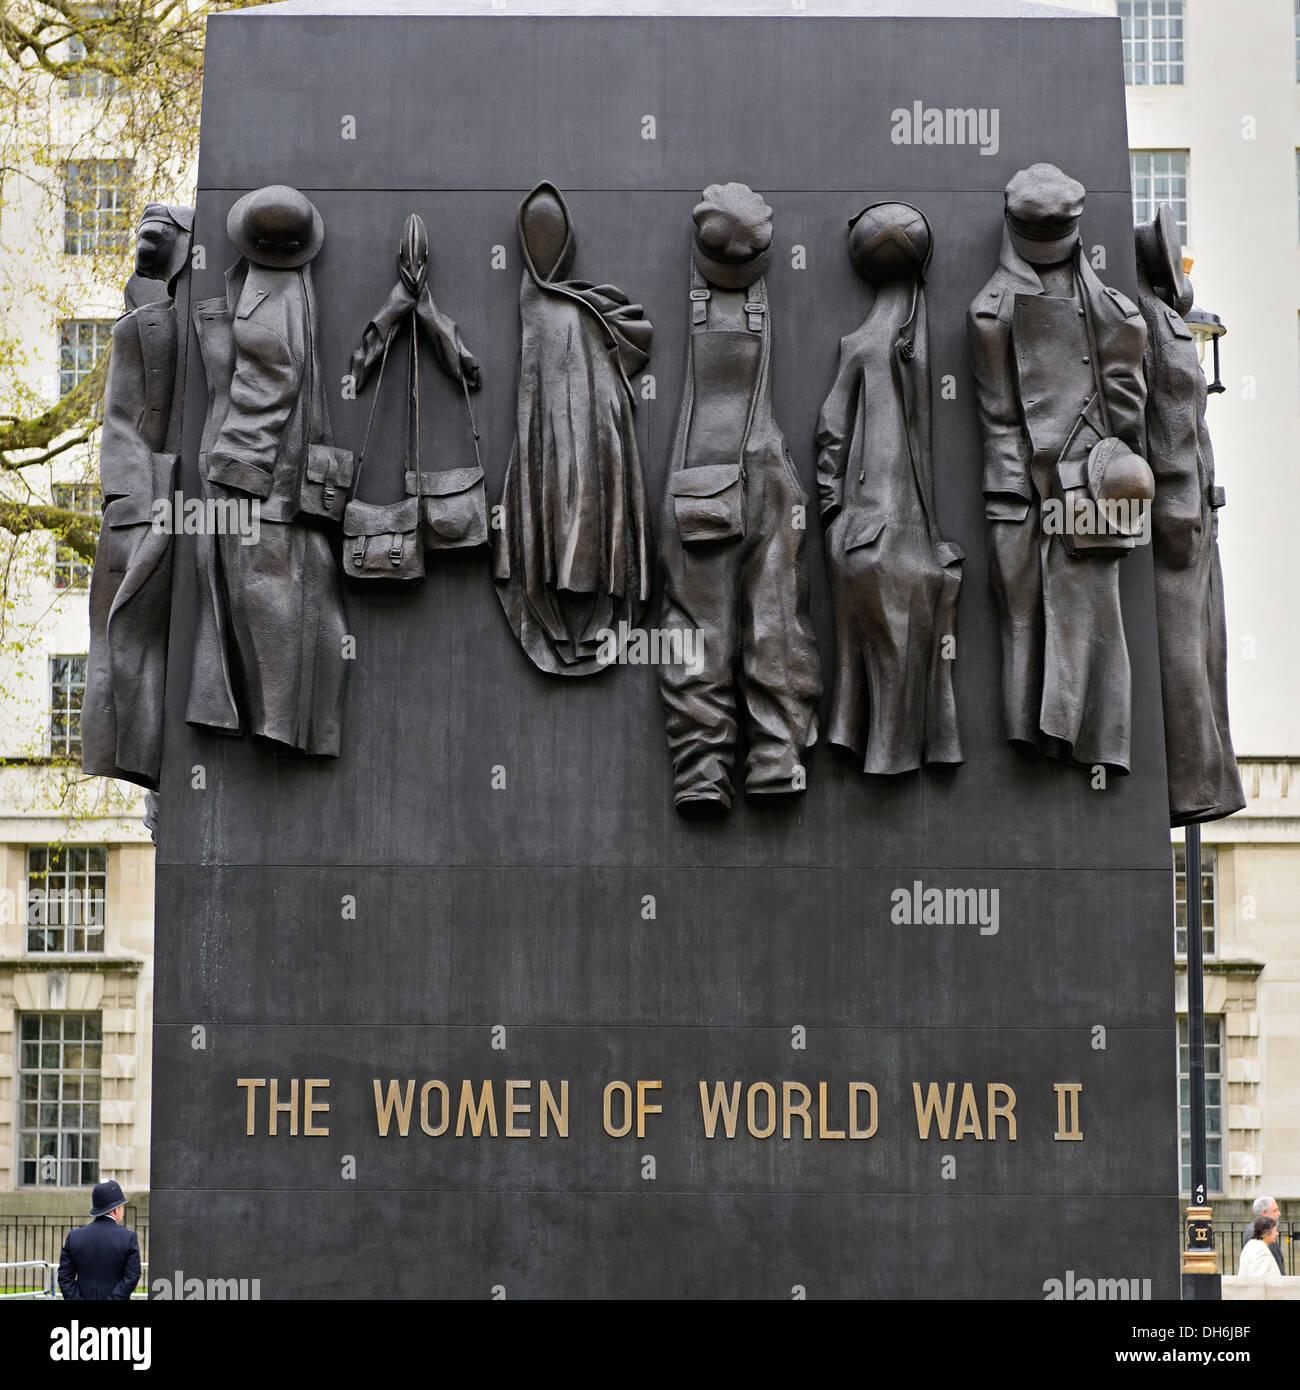 Monument to the Women of World War II, Whitehall, London, UK. - Stock Image